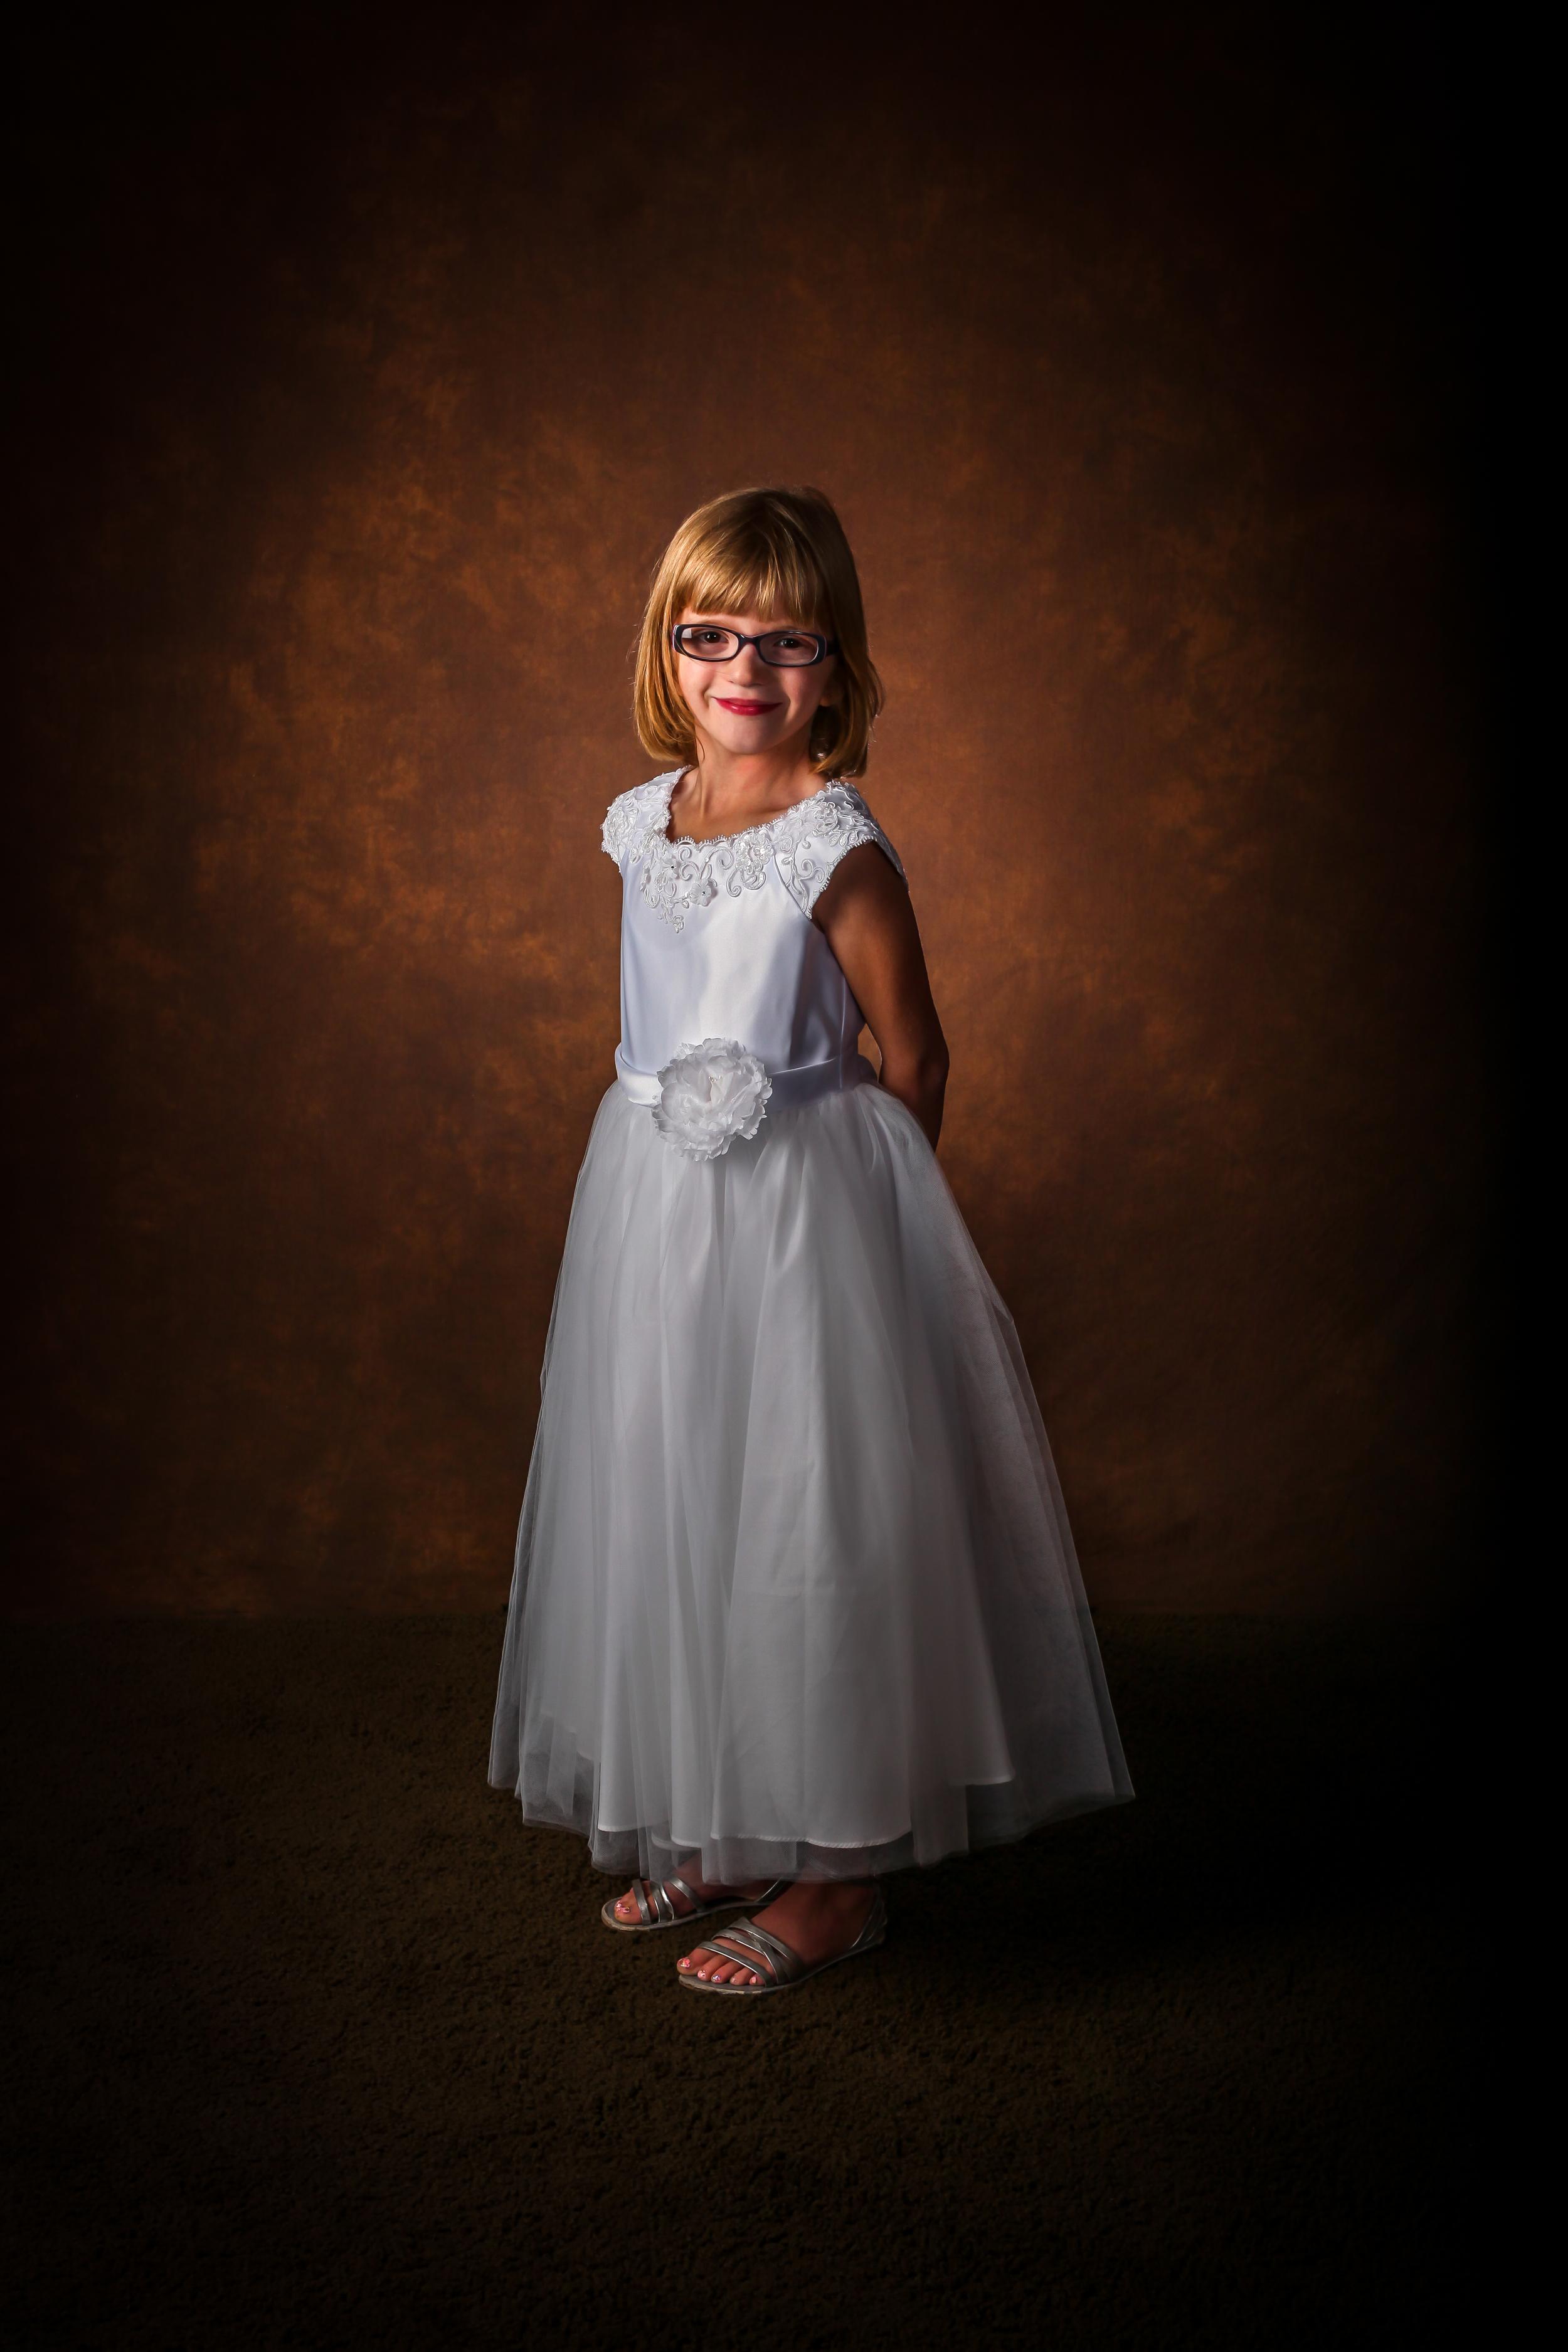 Bountiful portrait studio Baptism photography